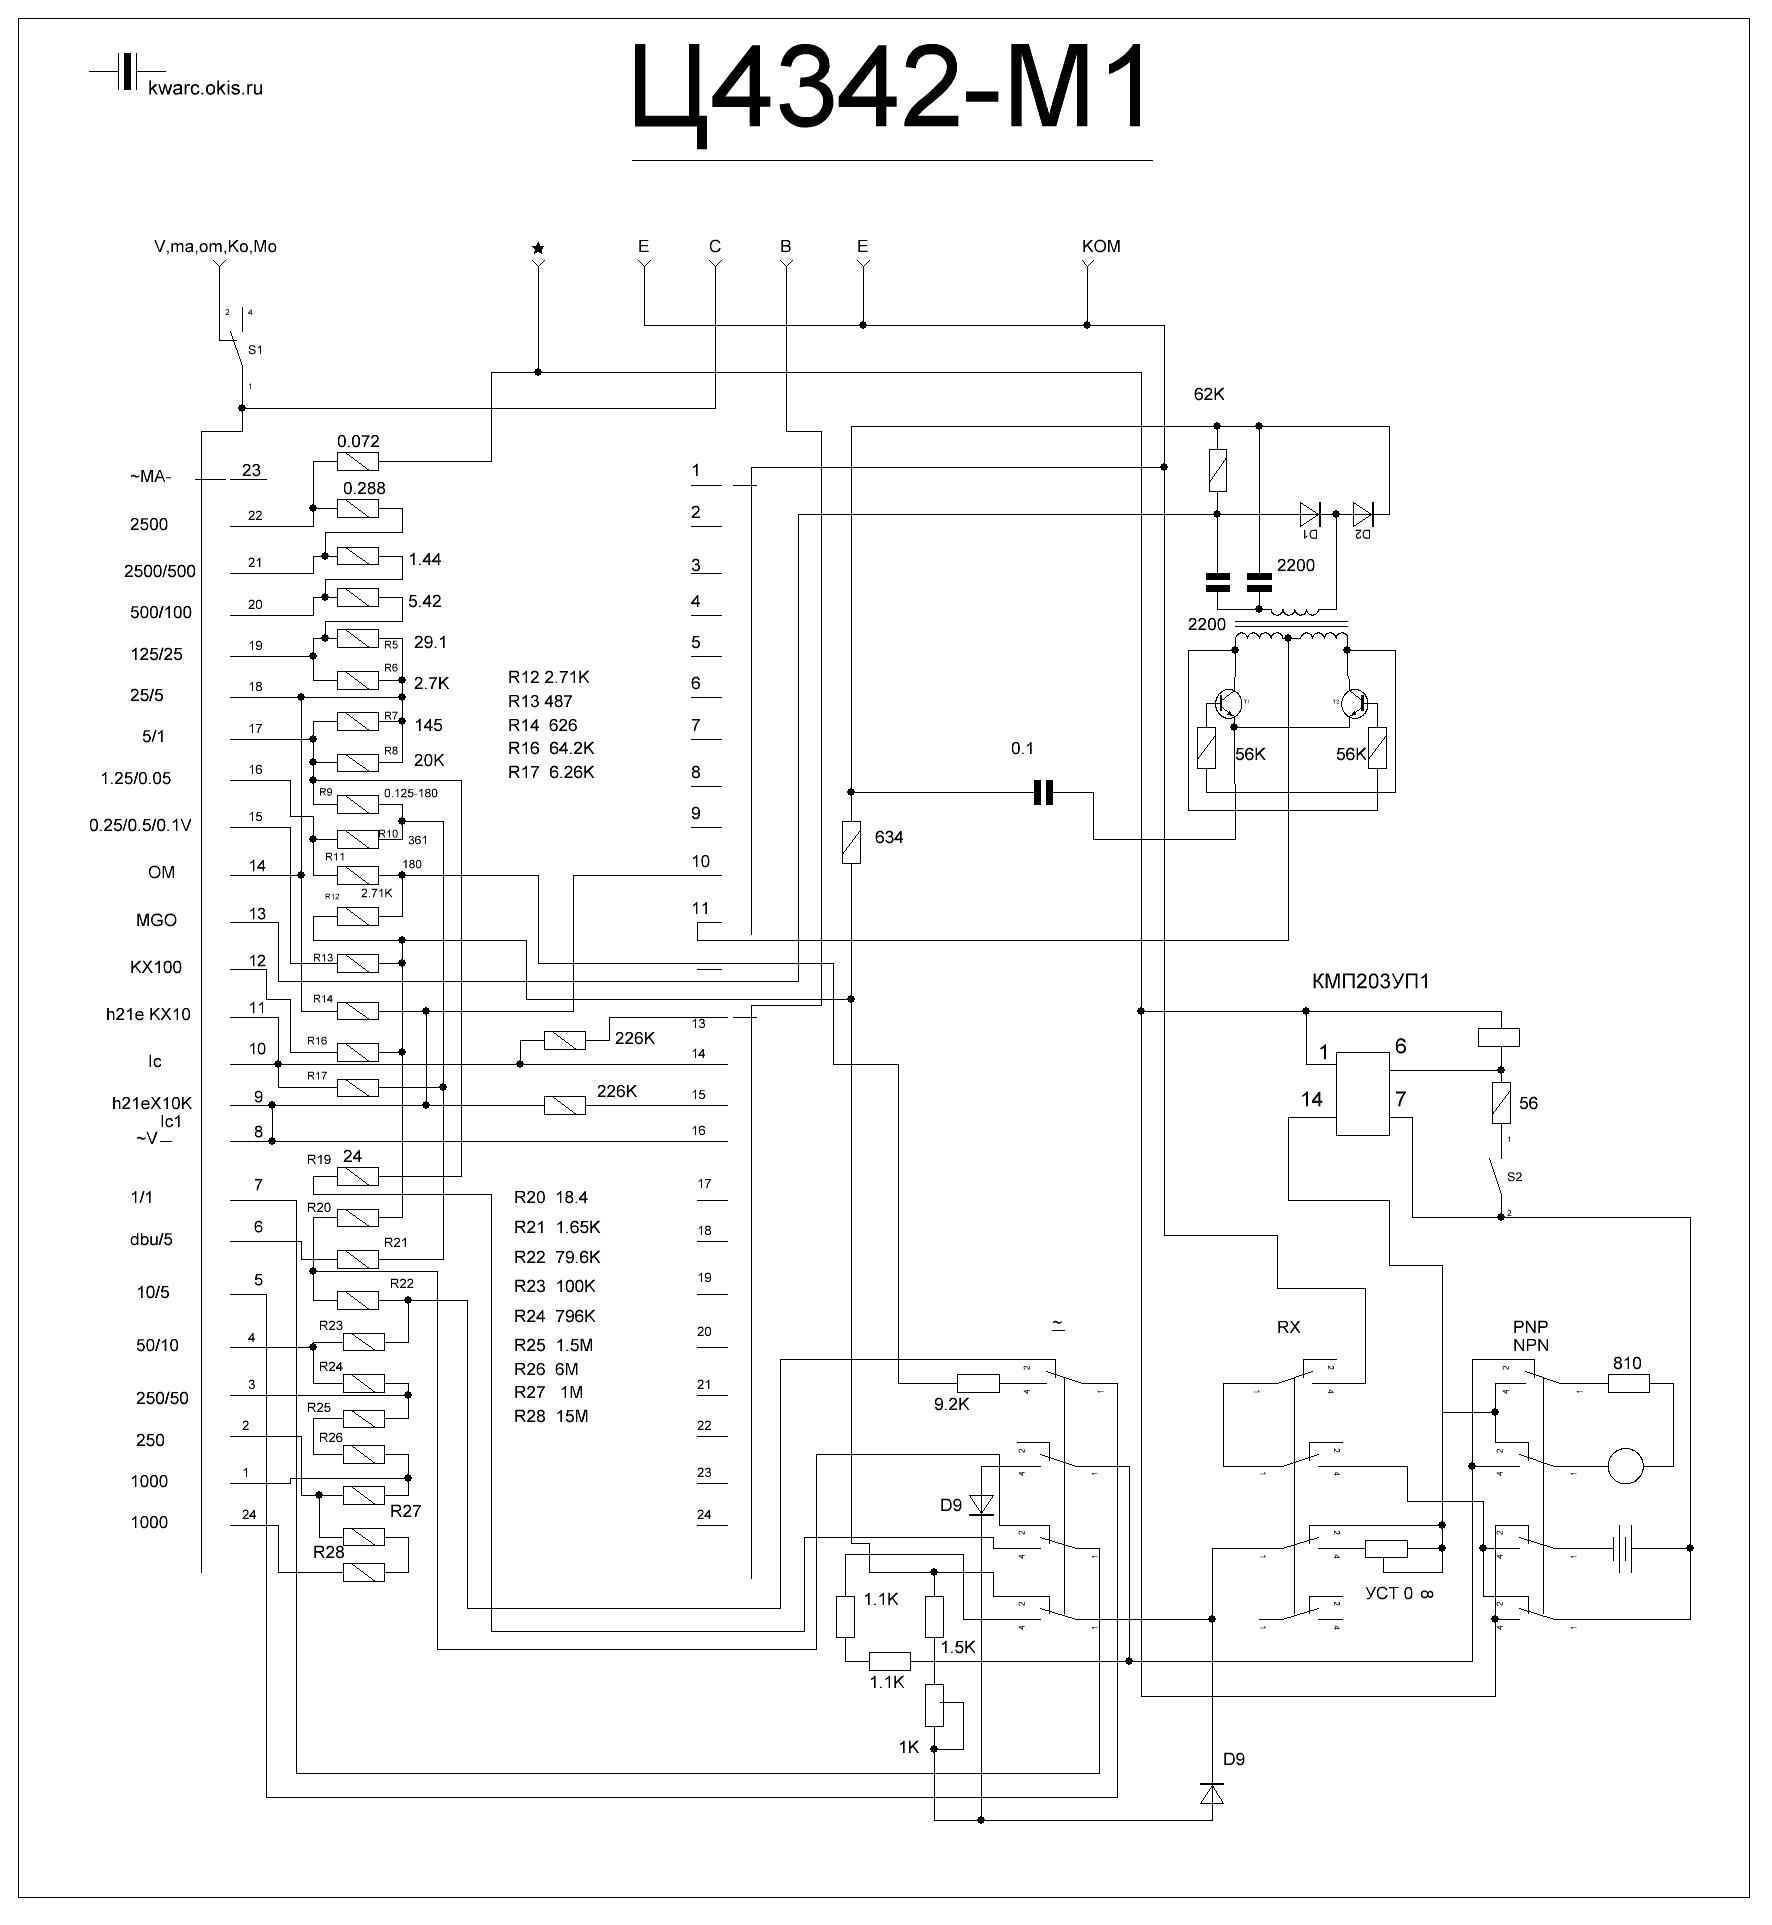 Тестер 43101 ремонт своими руками